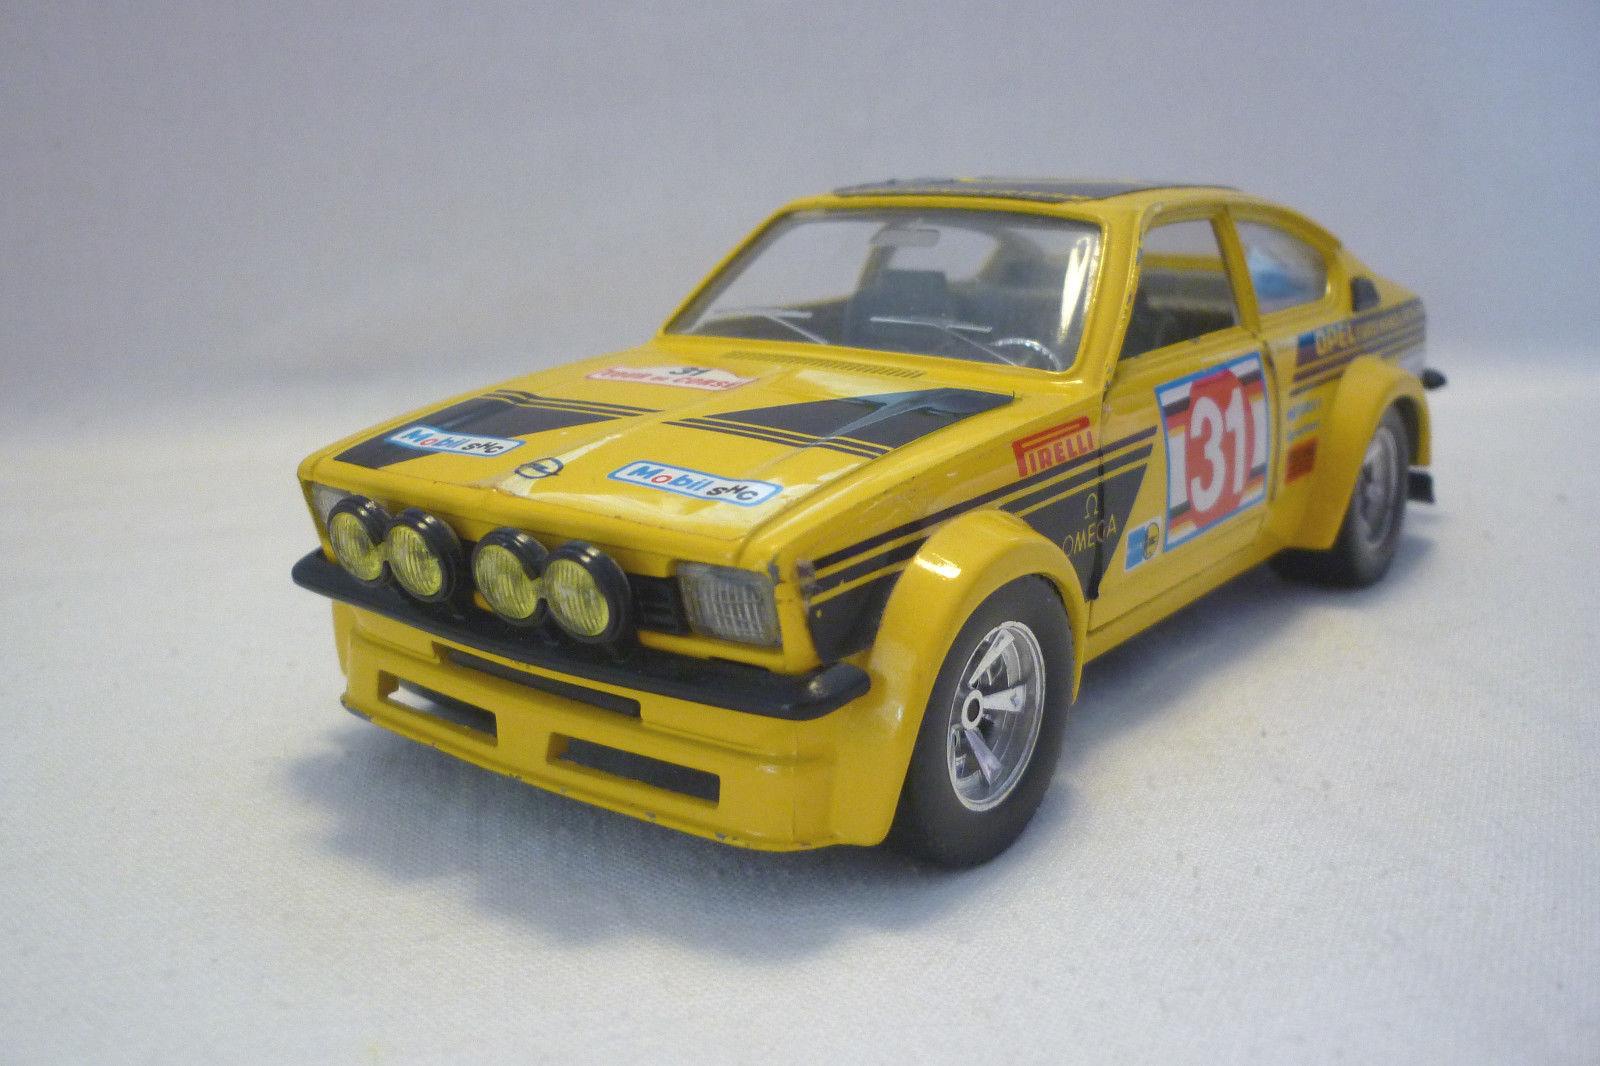 Bburago  modellolo in Mettuttio  Opel Kadett Gte Rtuttiy  1 24  5.DIV25